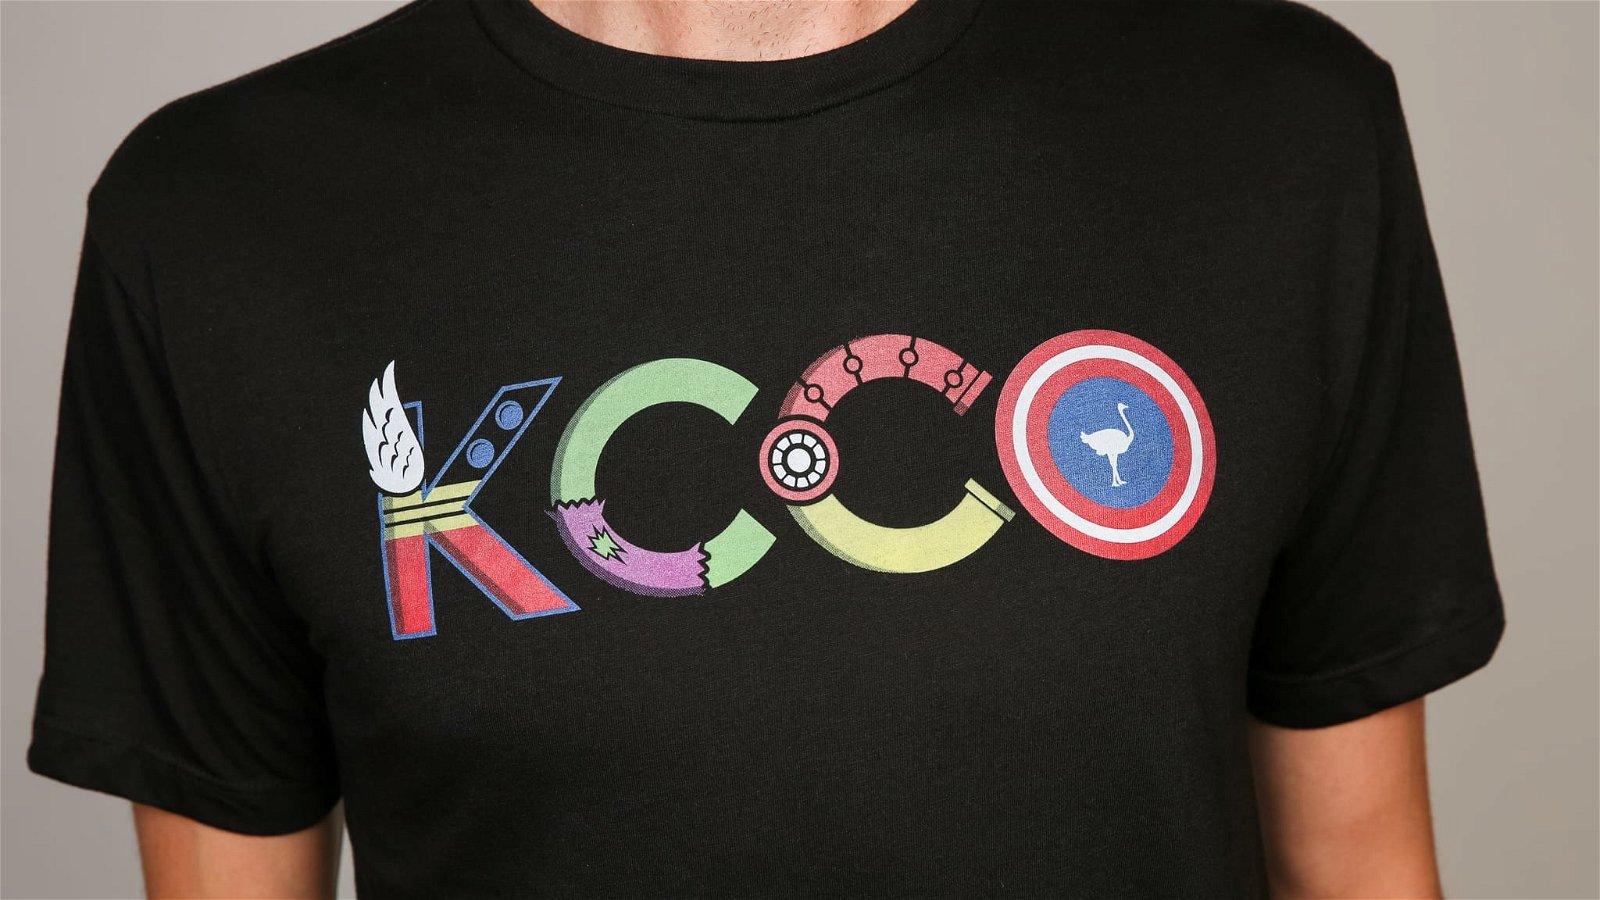 KCCO CHIVEngers Tee